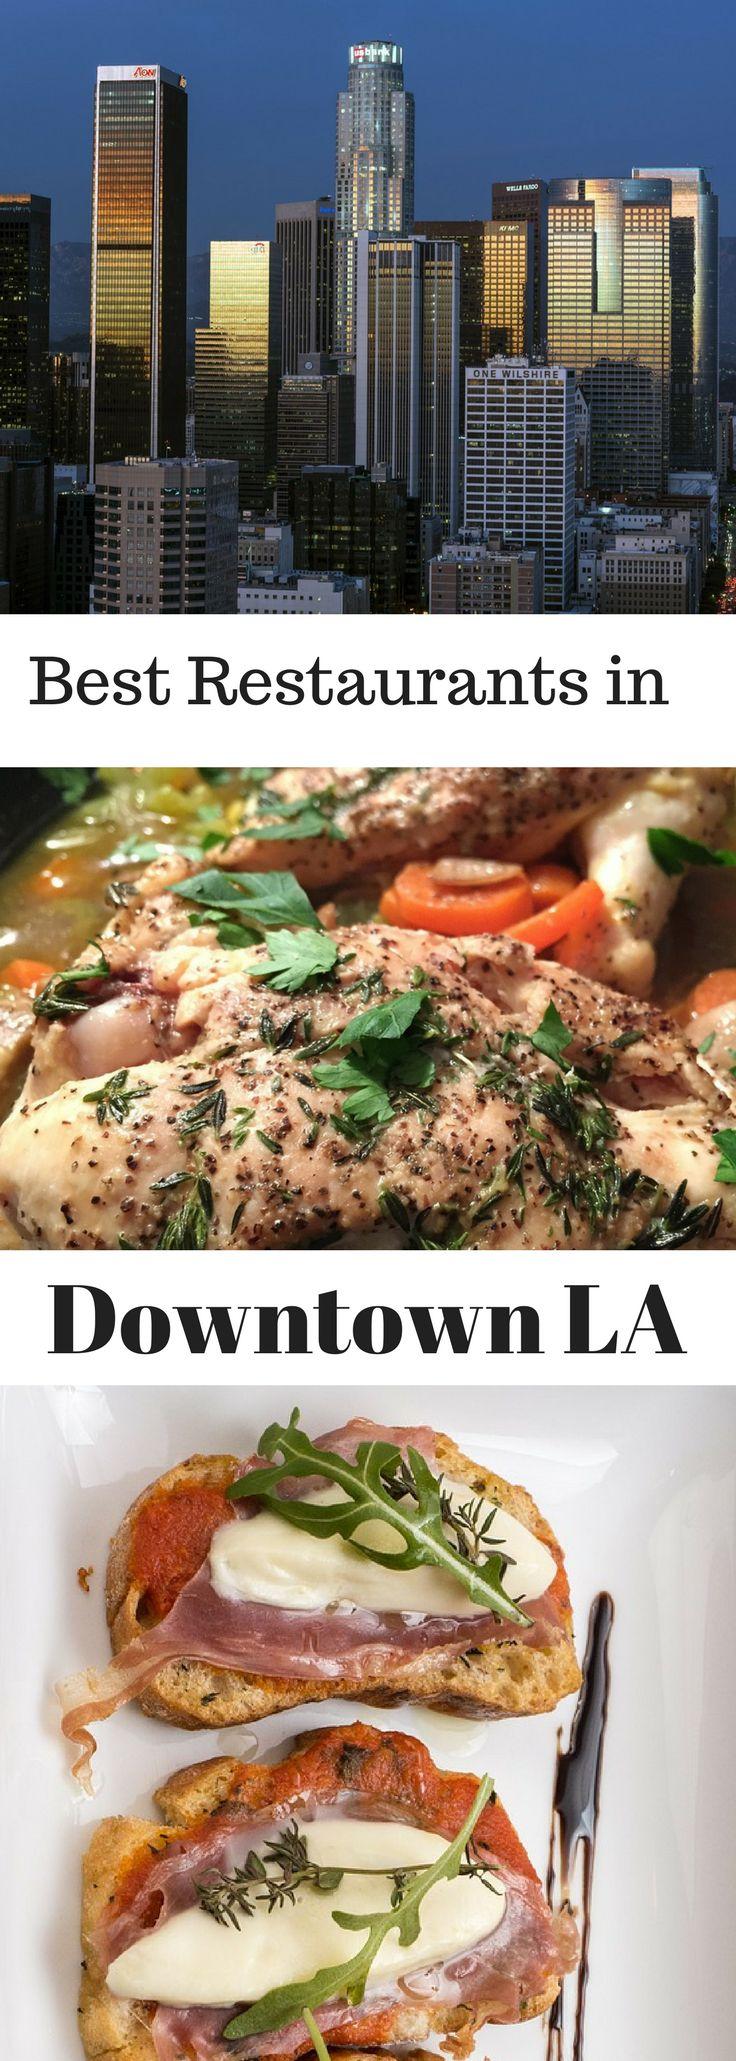 restaurants downtown la   downtown la restaurants   los angeles restaurants   downtown restaurants